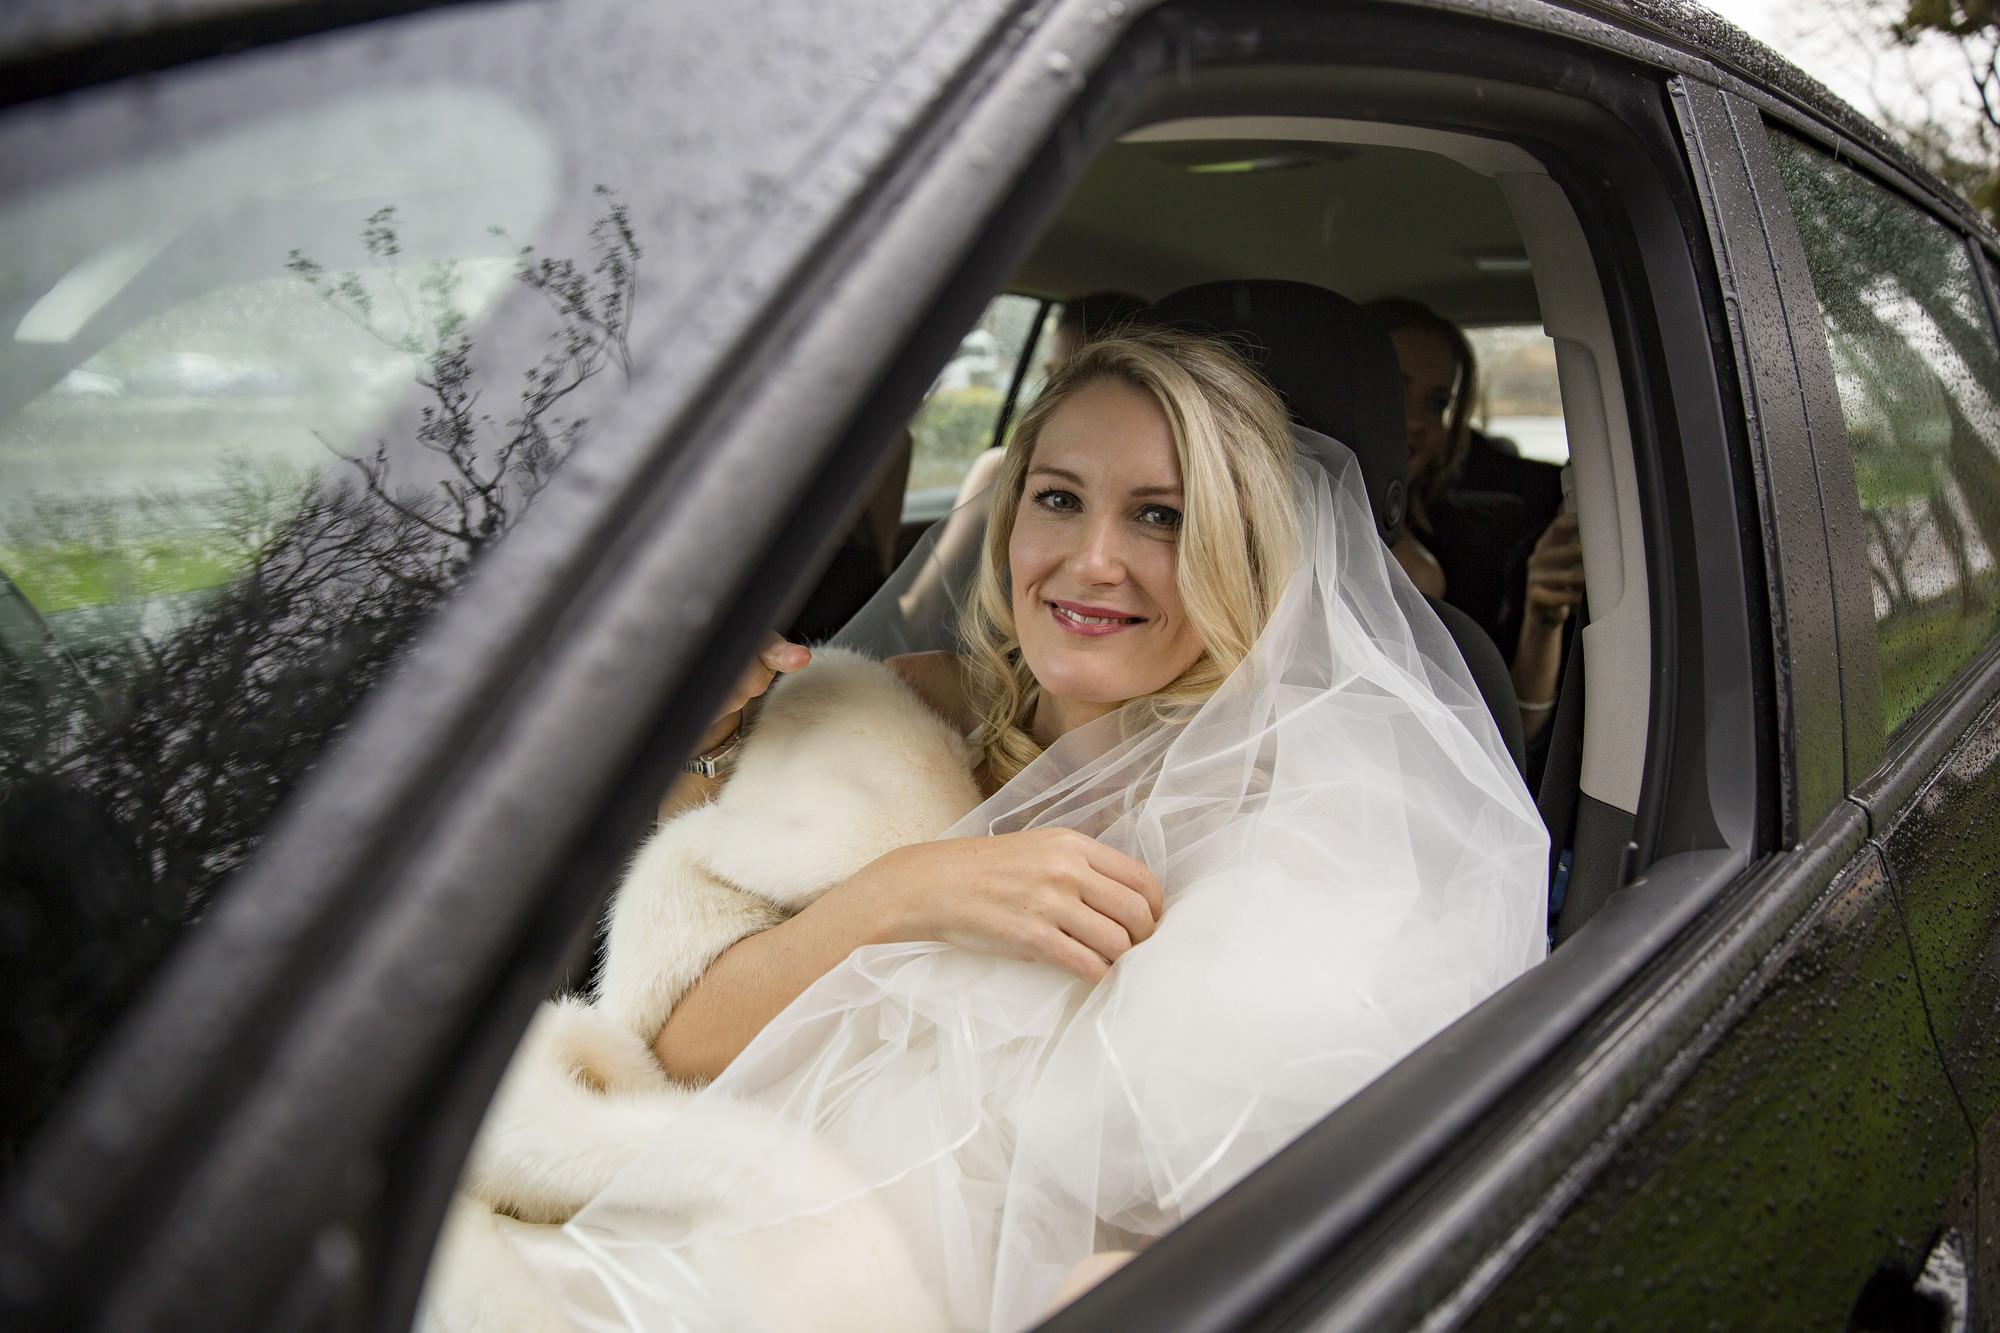 muckross_park_hotel_grougane_barra_wedding_photographer_goldenmoments_033.jpg